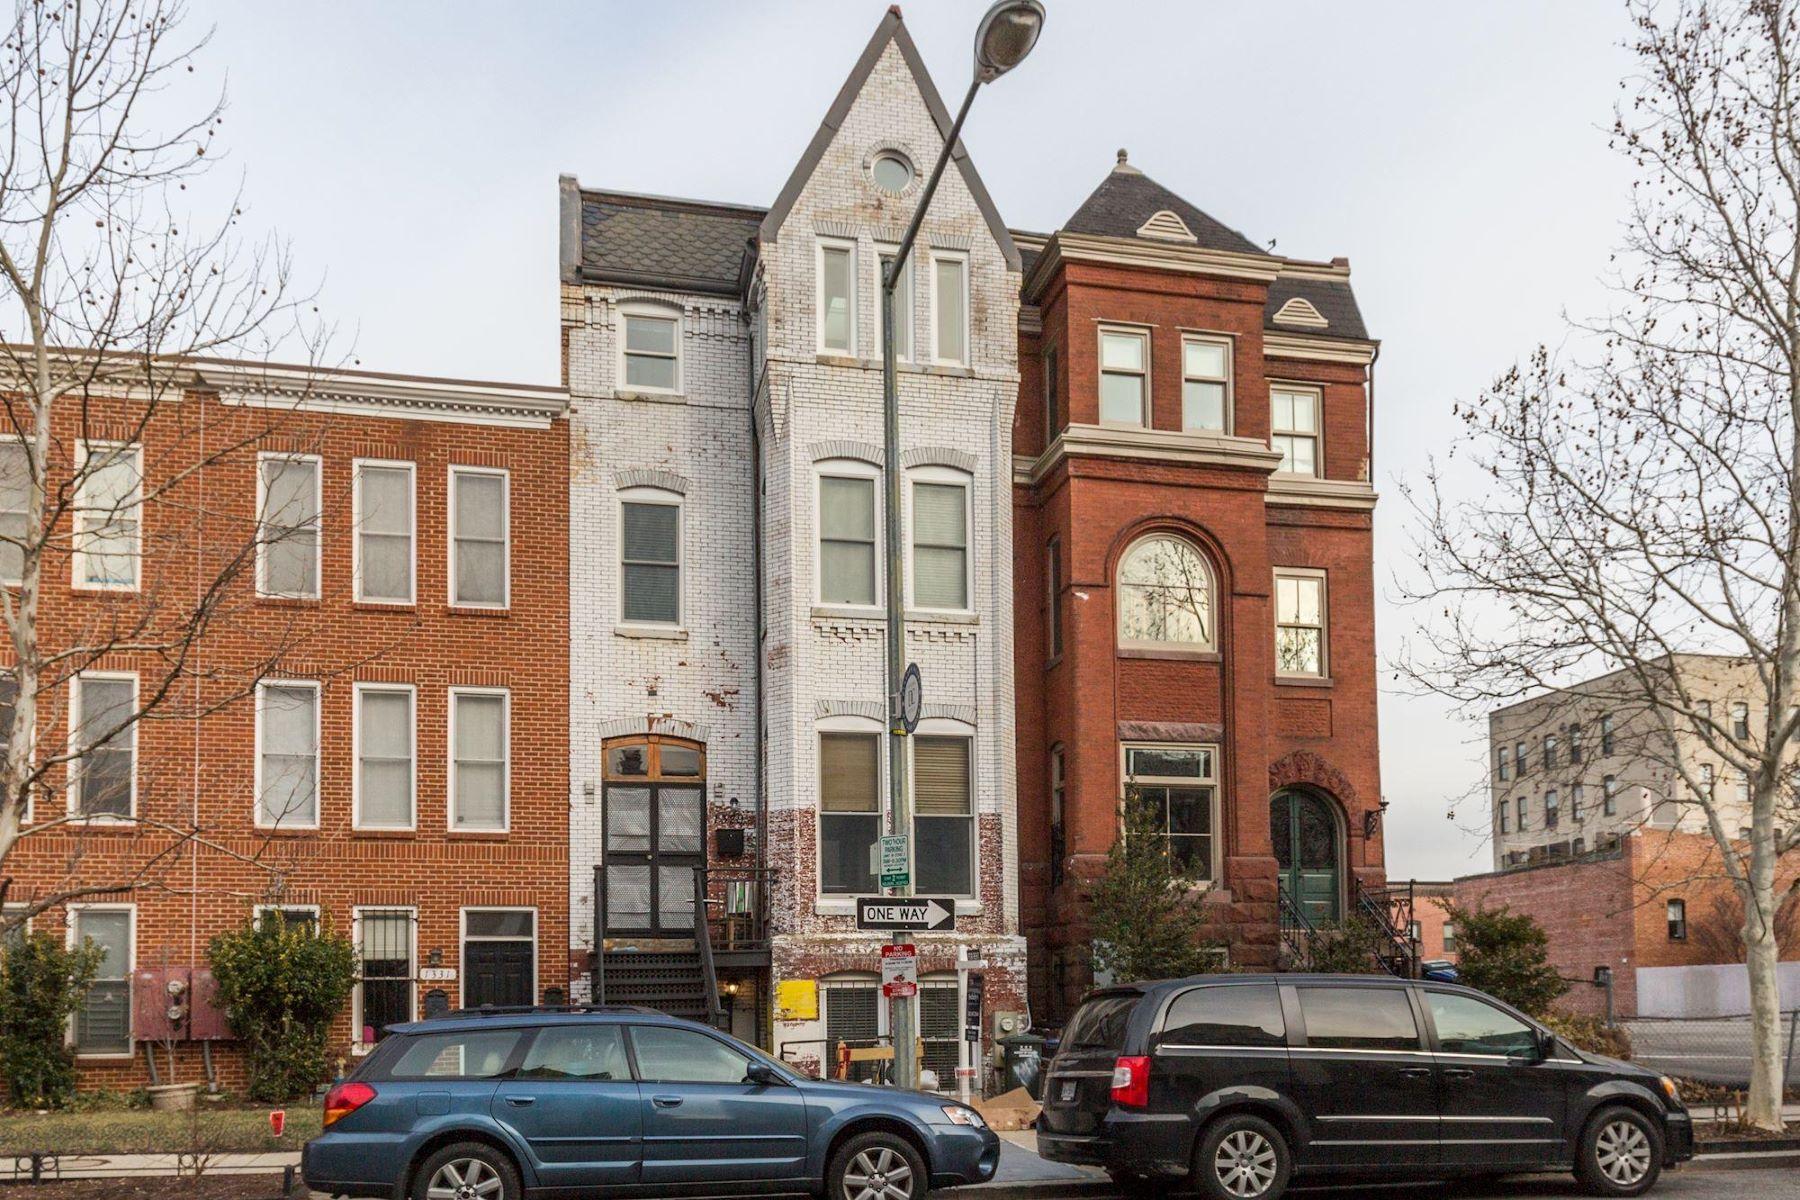 سكني آخر للـ Rent في 1329 10th St Nw #b Washington, District Of Columbia, 20001 United States